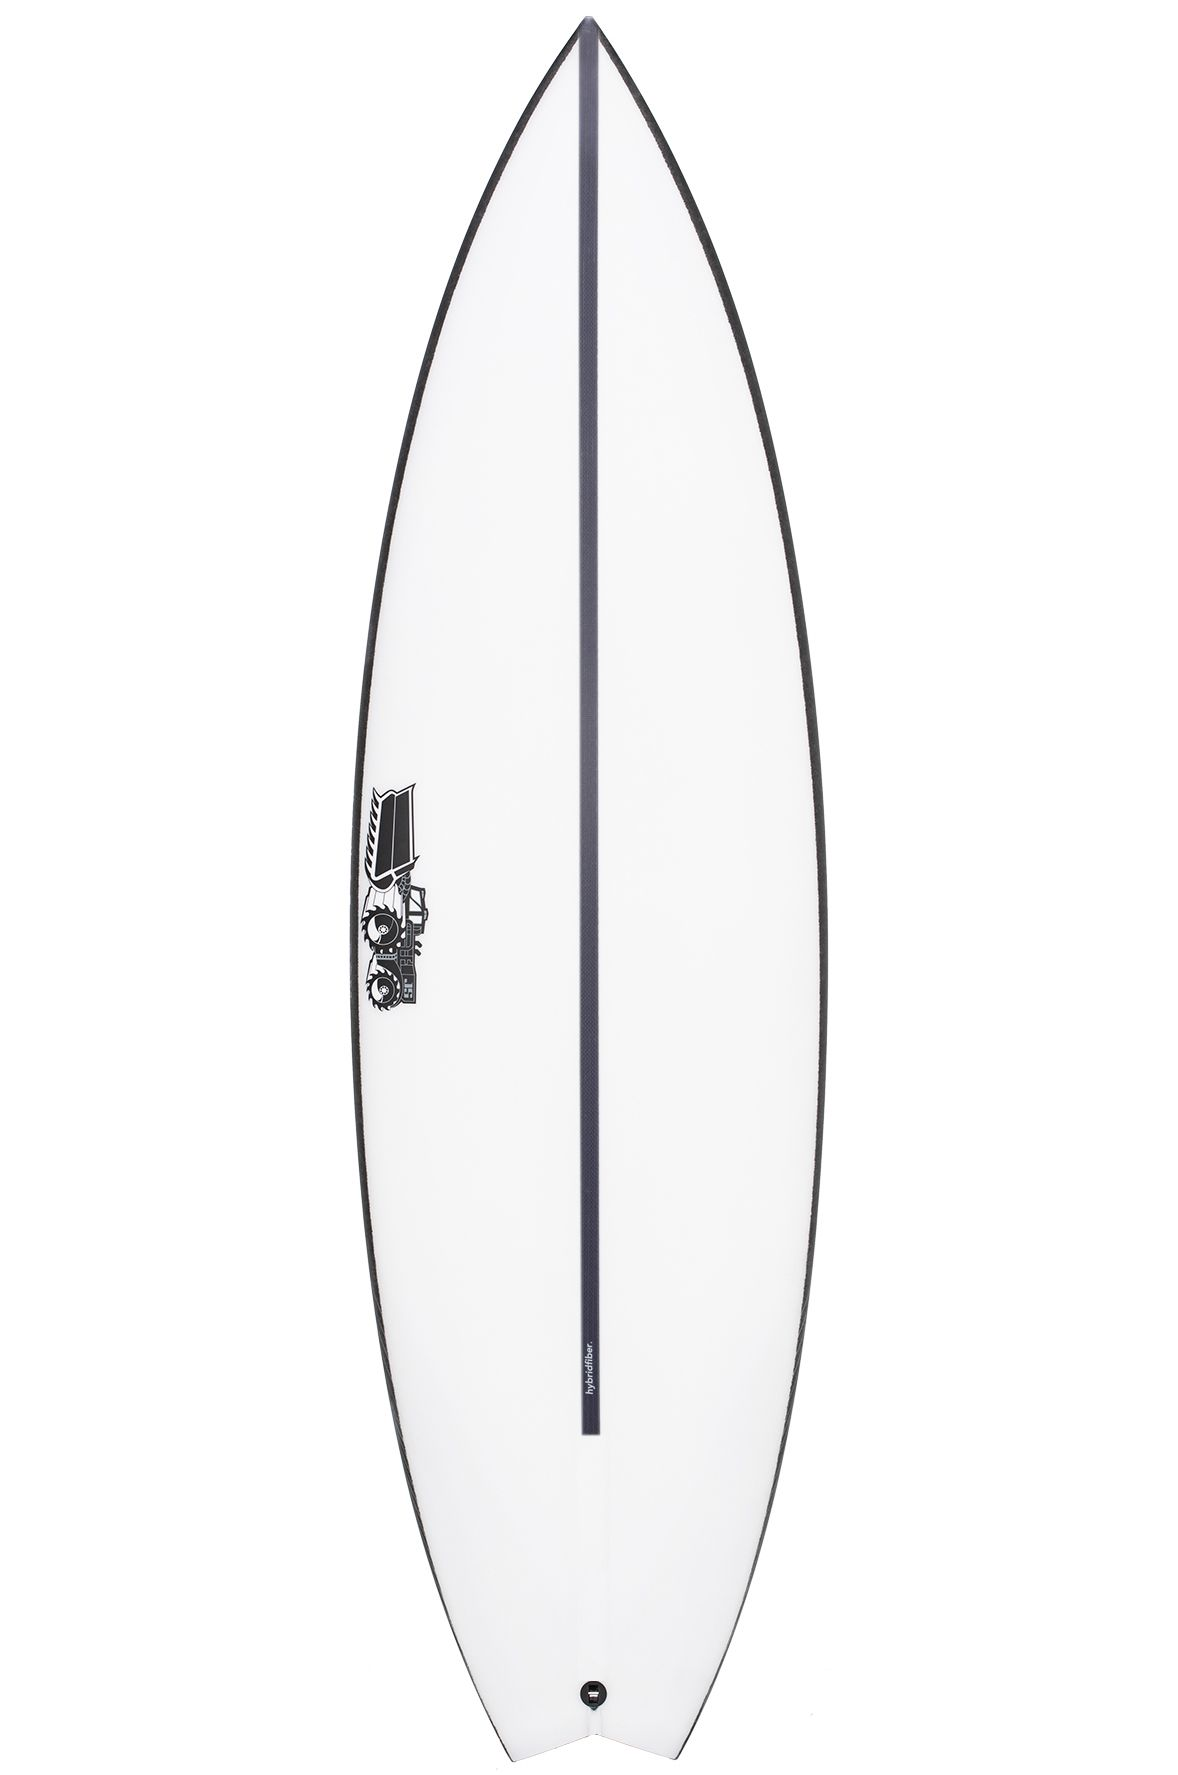 Prancha Surf JS 5'8 MONSTA BOX HYFI Swallow Tail - Color FCS II 5ft8